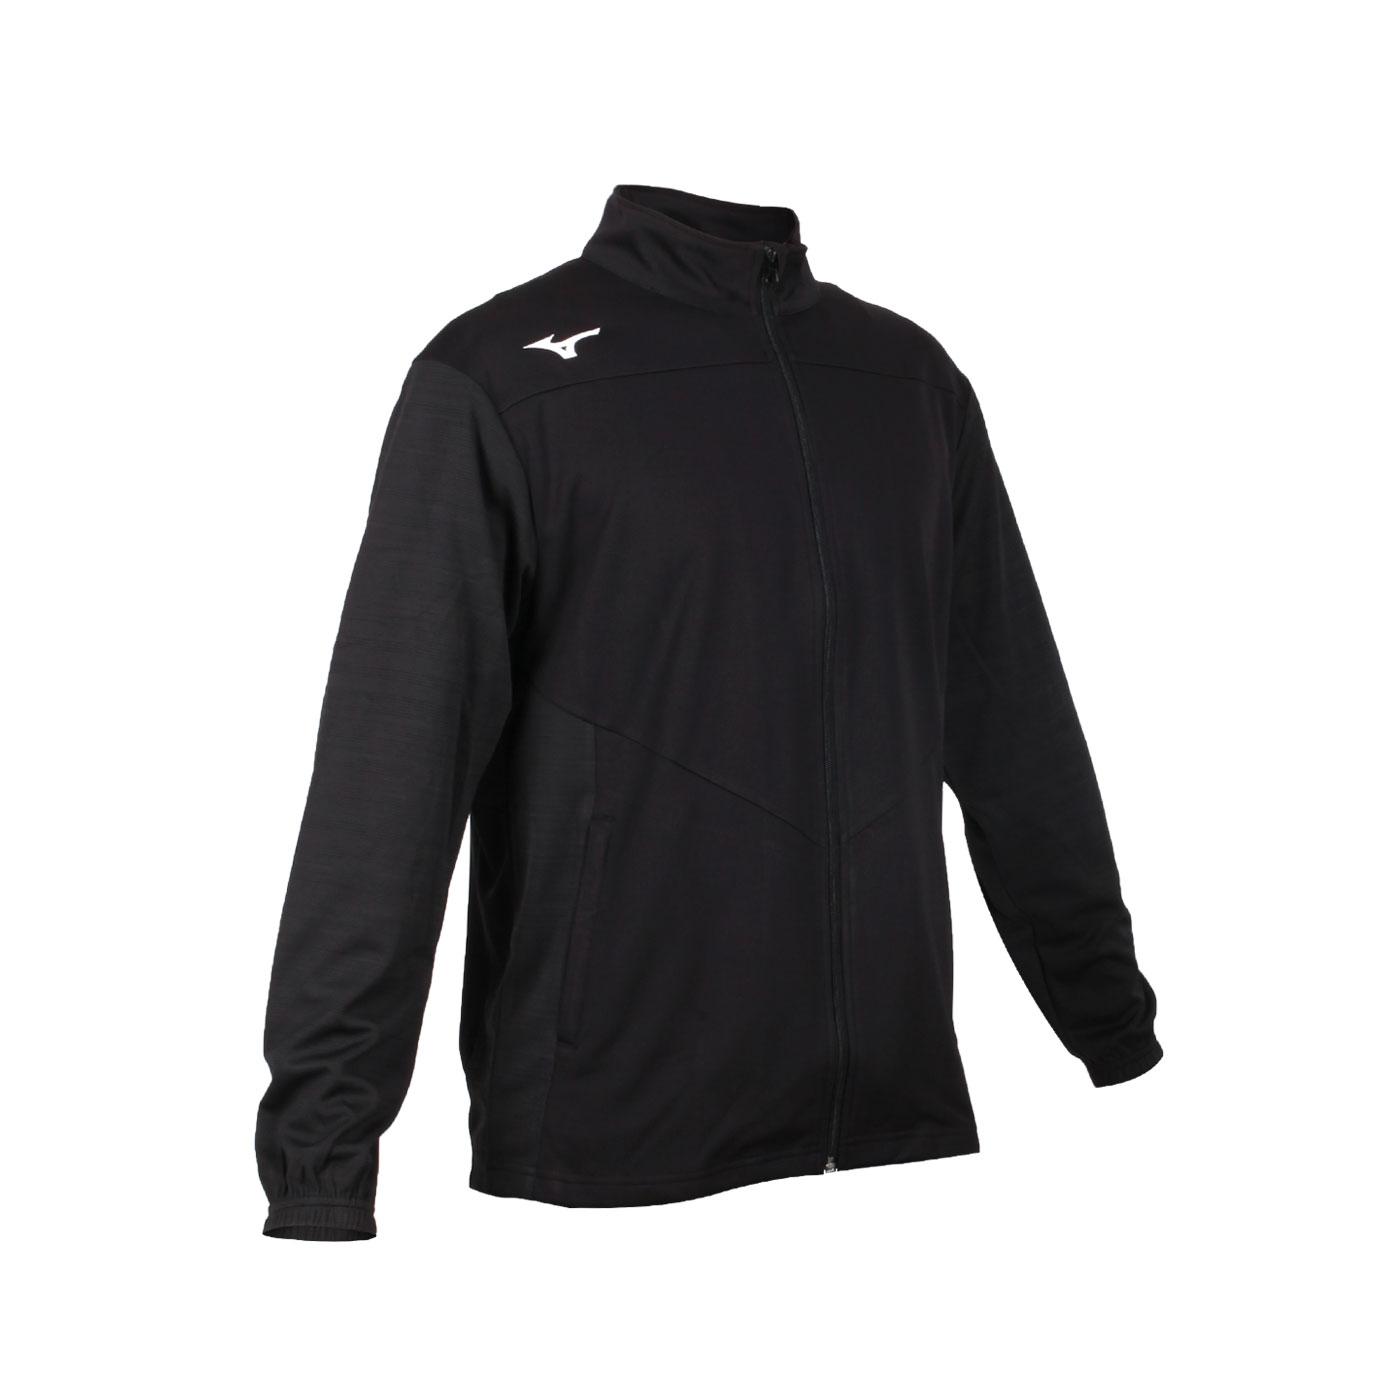 MIZUNO 男款針織運動外套 32TC053399 - 黑深灰白